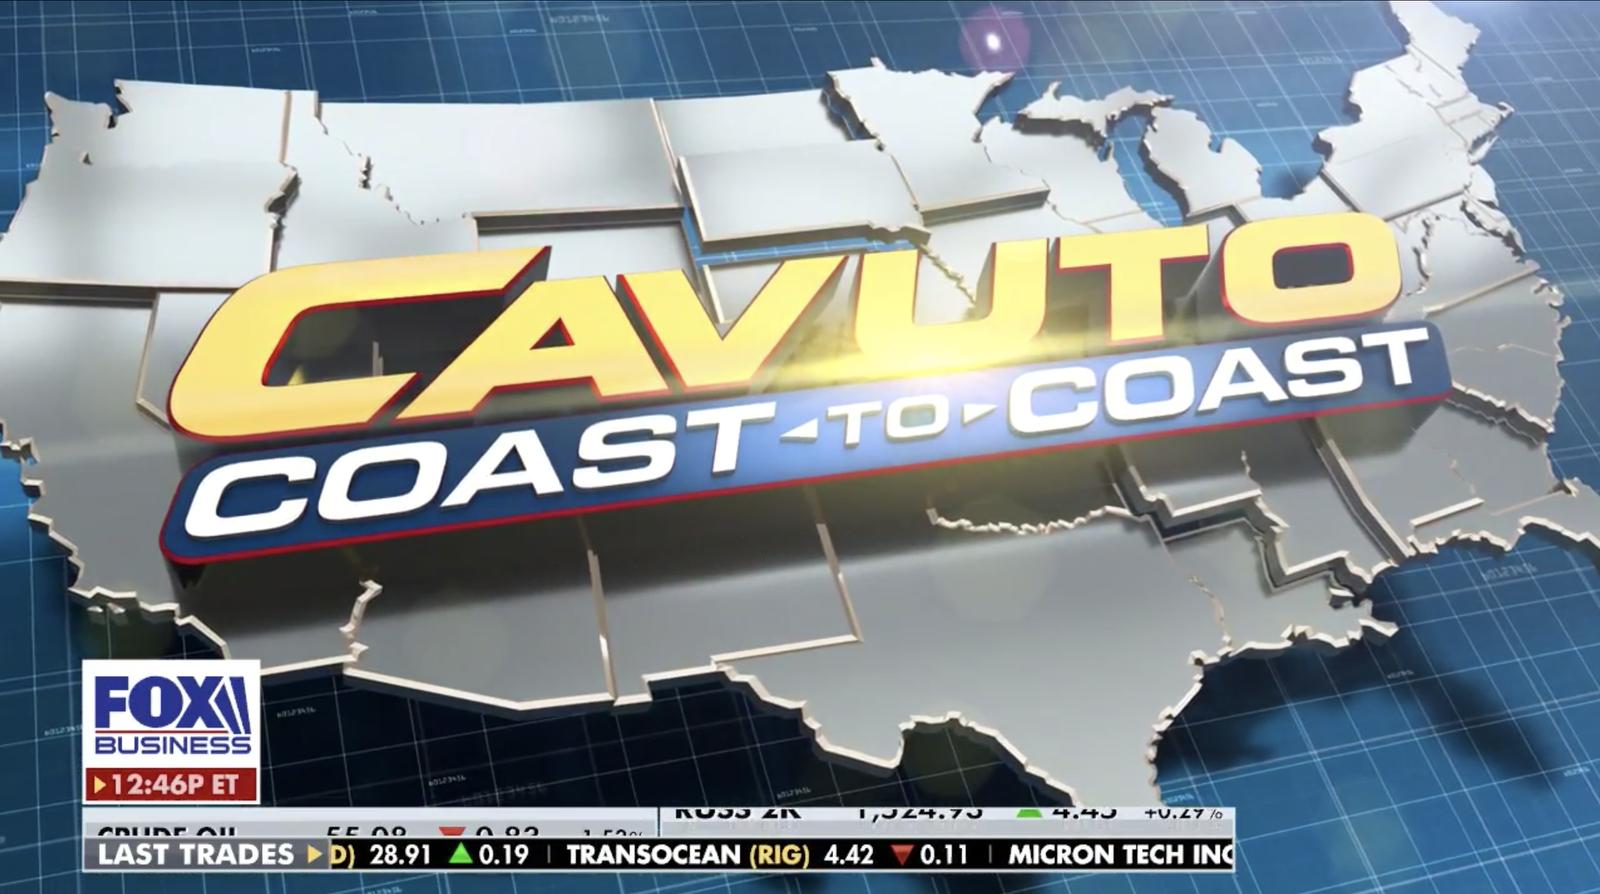 NCS_Fox-Business_Cavuto-Coast-to-Coast_Motion-Graphics_015